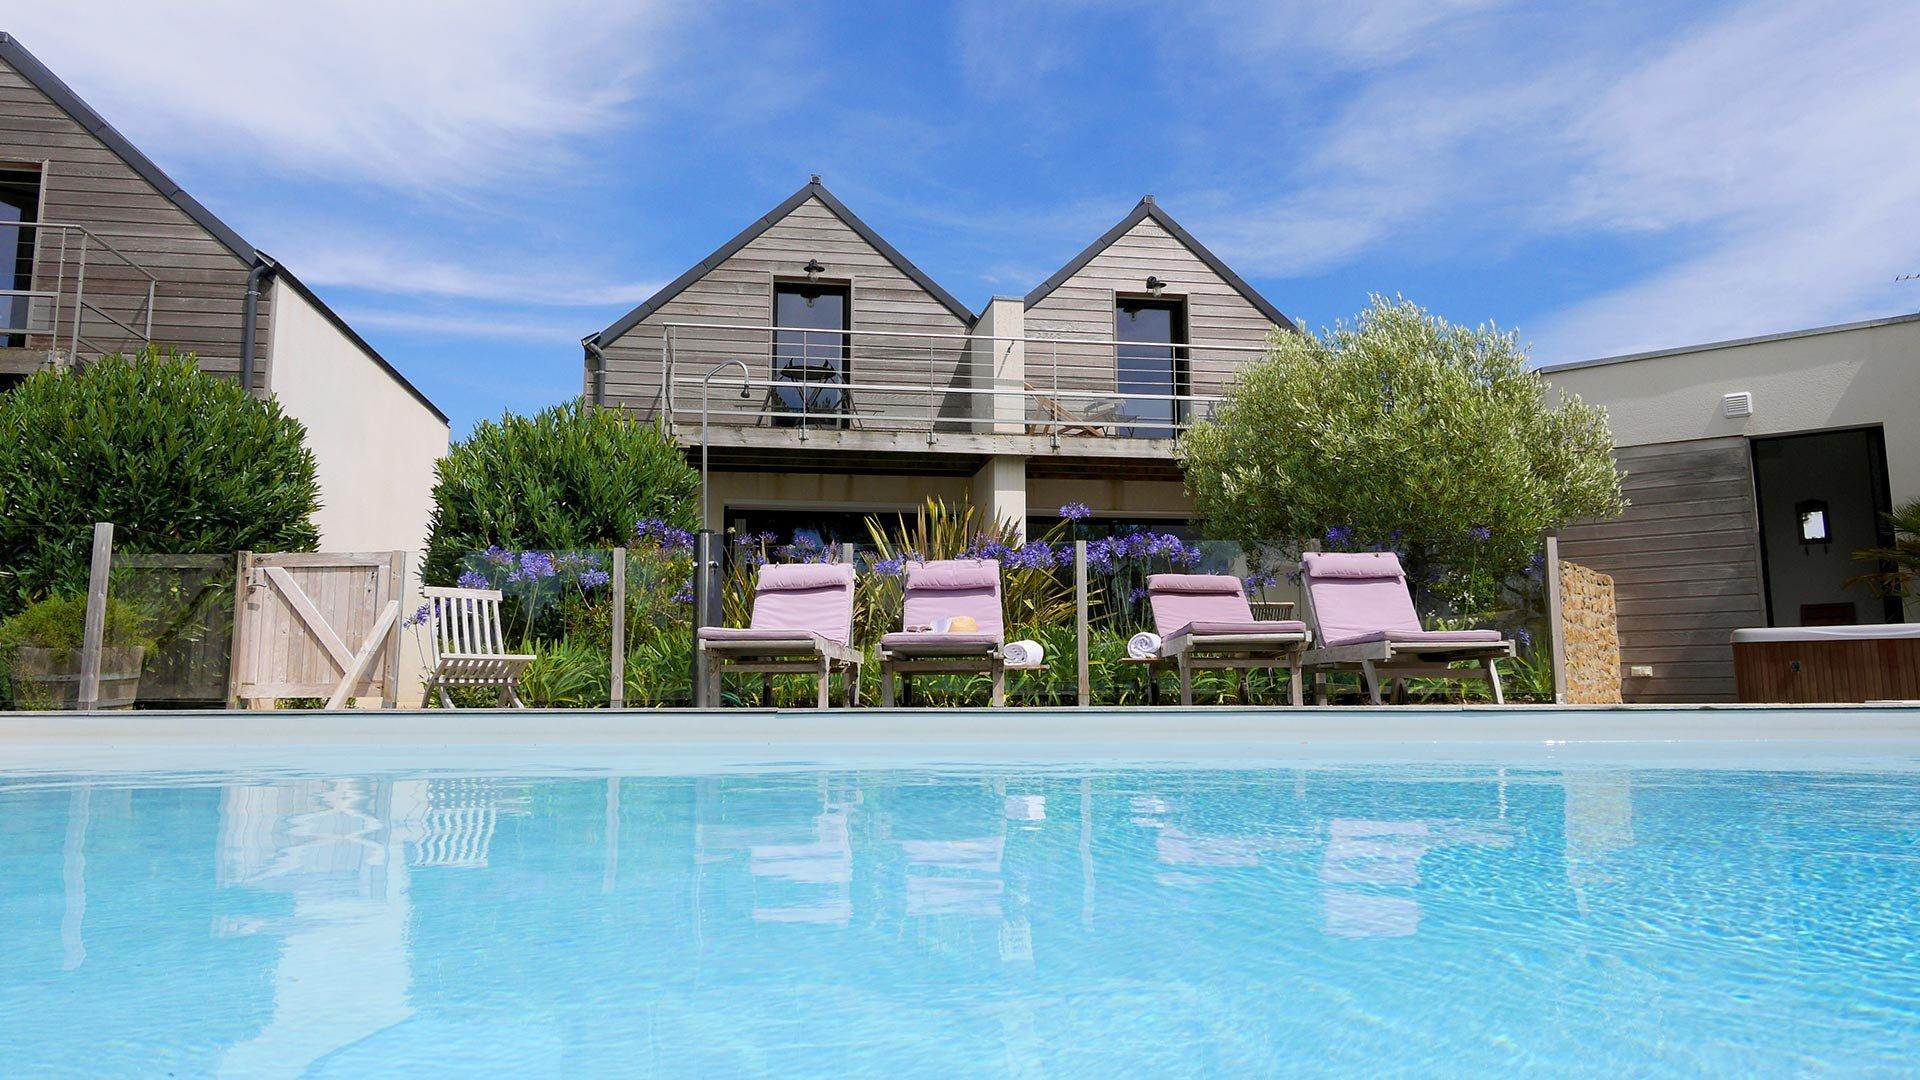 Chambre d 39 h te avec piscine carnac villa mane lann - Chambre d hote quiberon avec piscine ...